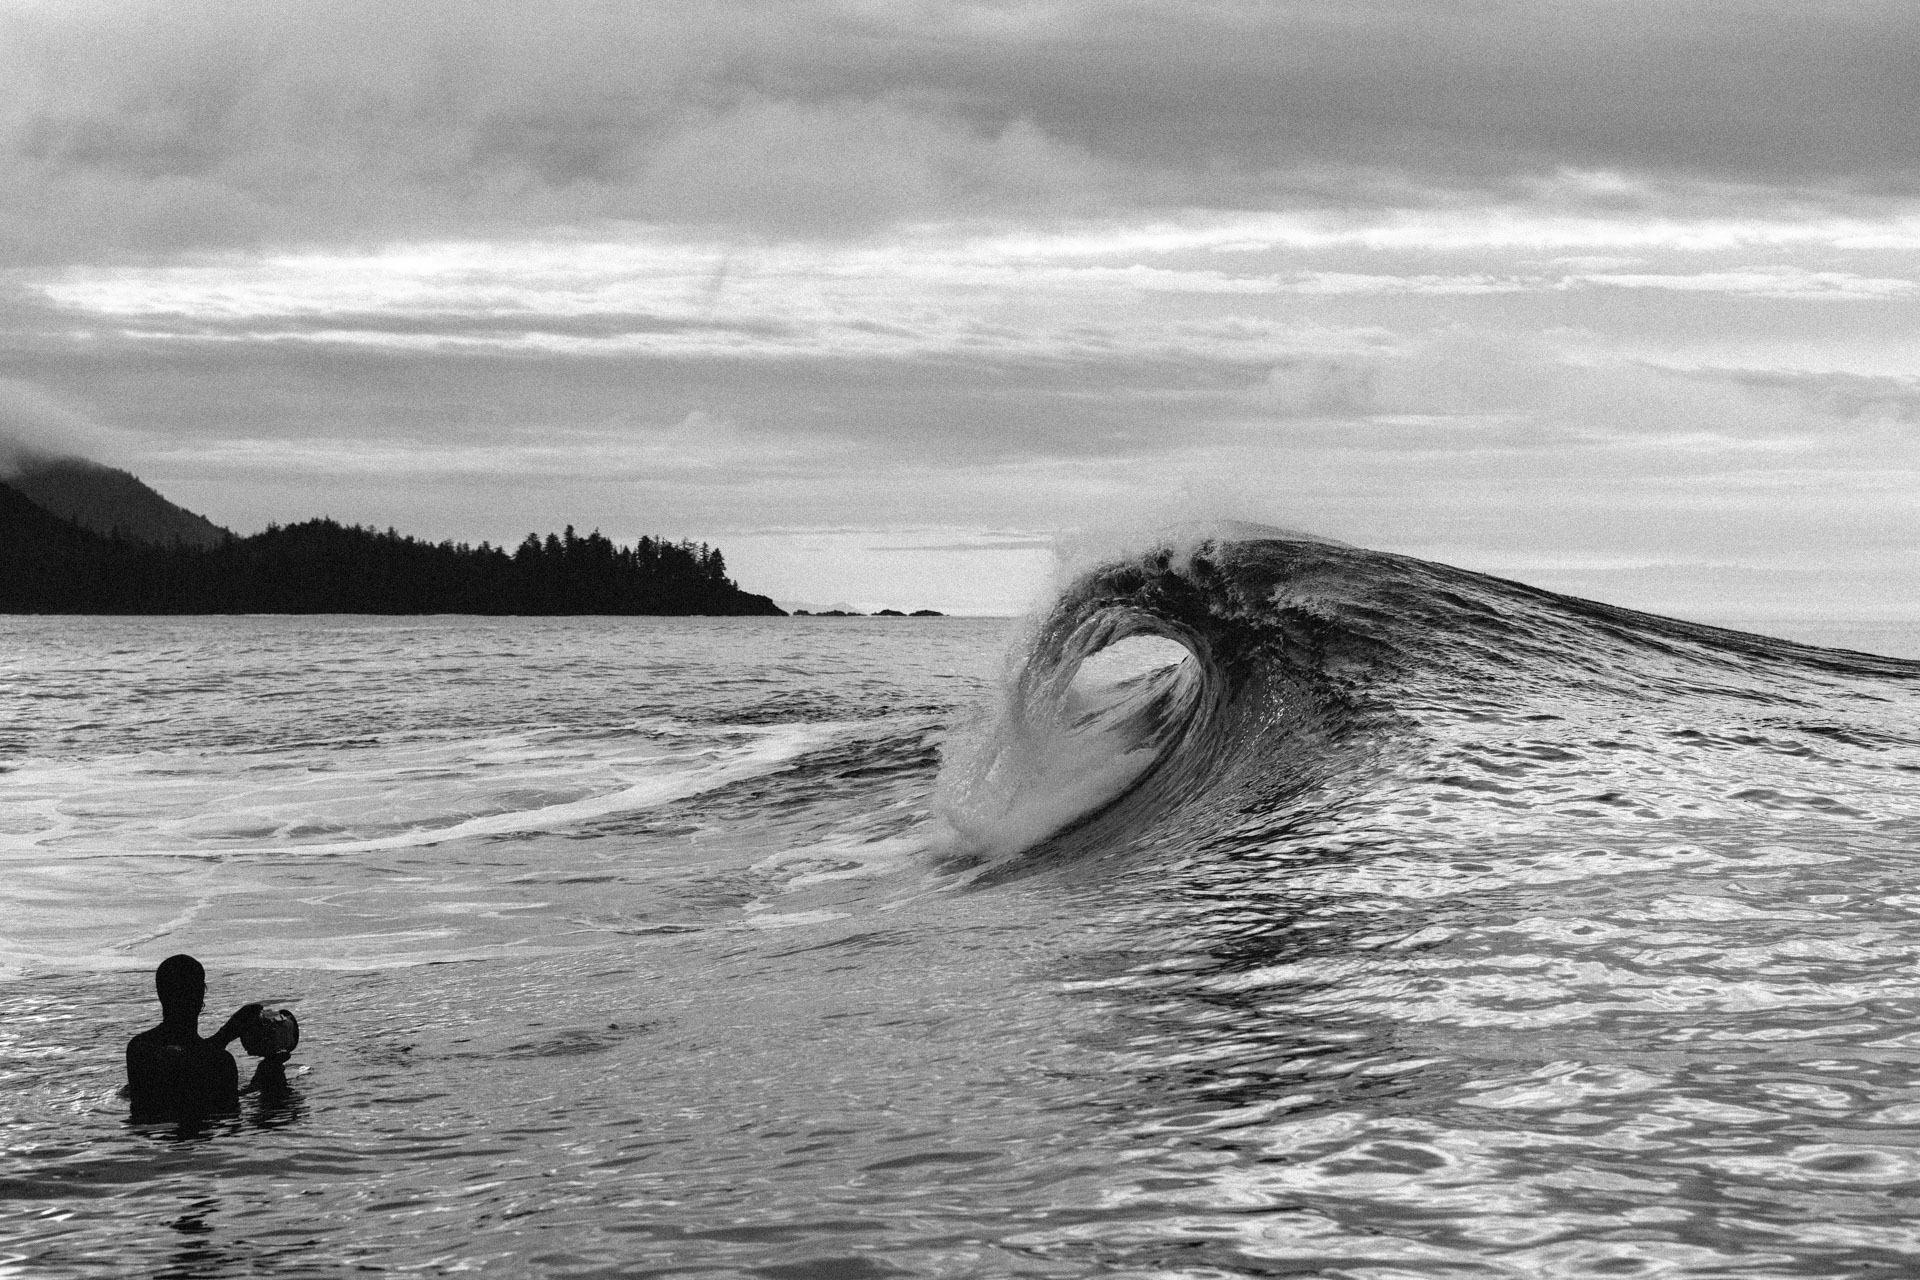 photo by Jeremy Koreski